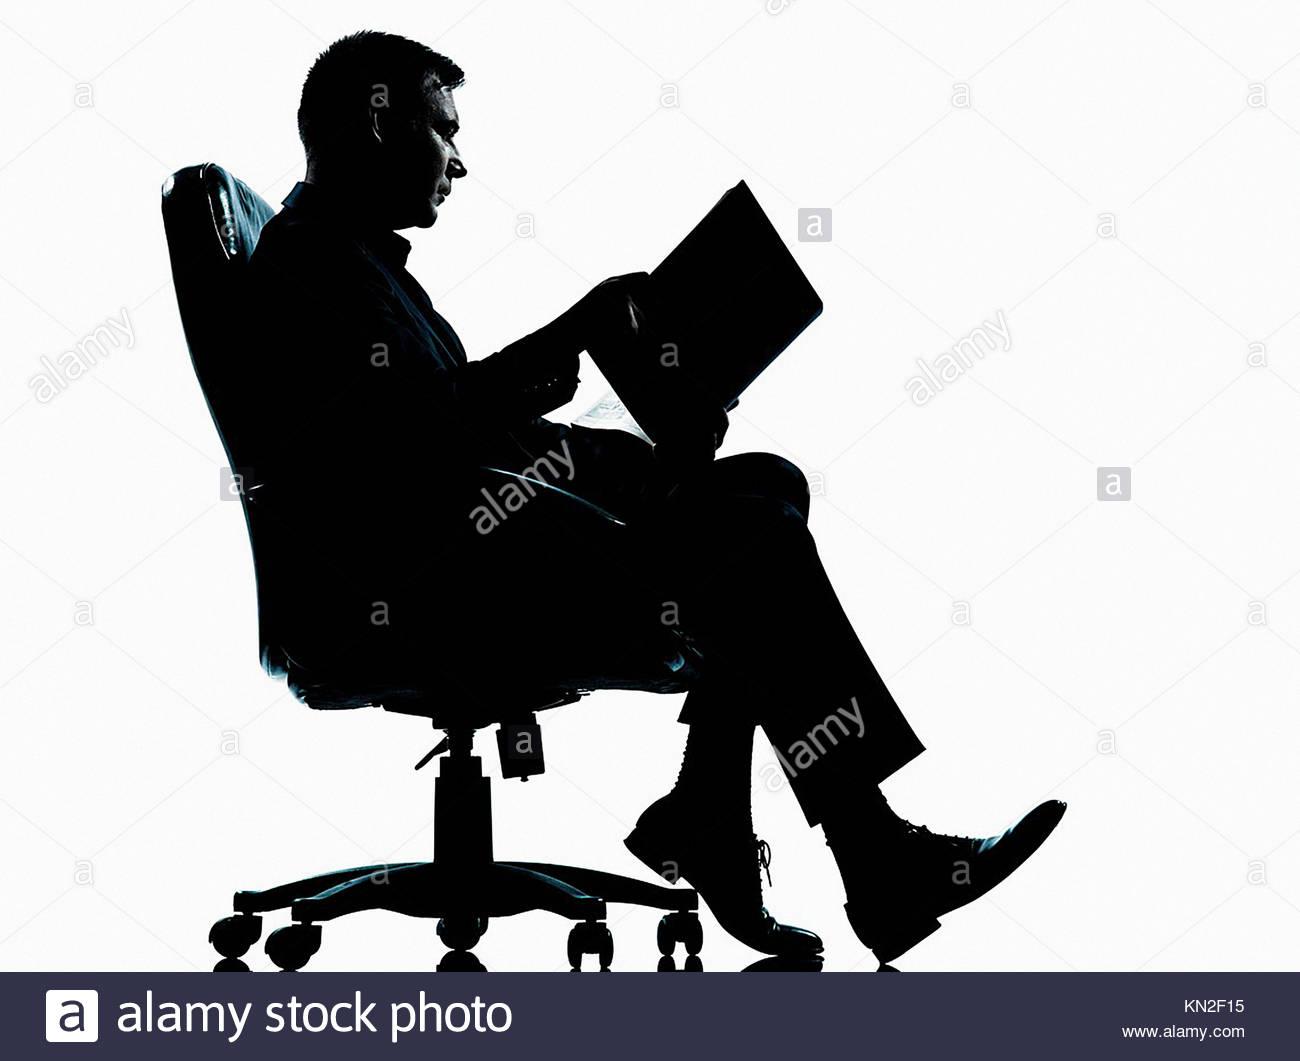 1300x1061 Man Sitting Silhouette Stock Photos Amp Man Sitting Silhouette Stock